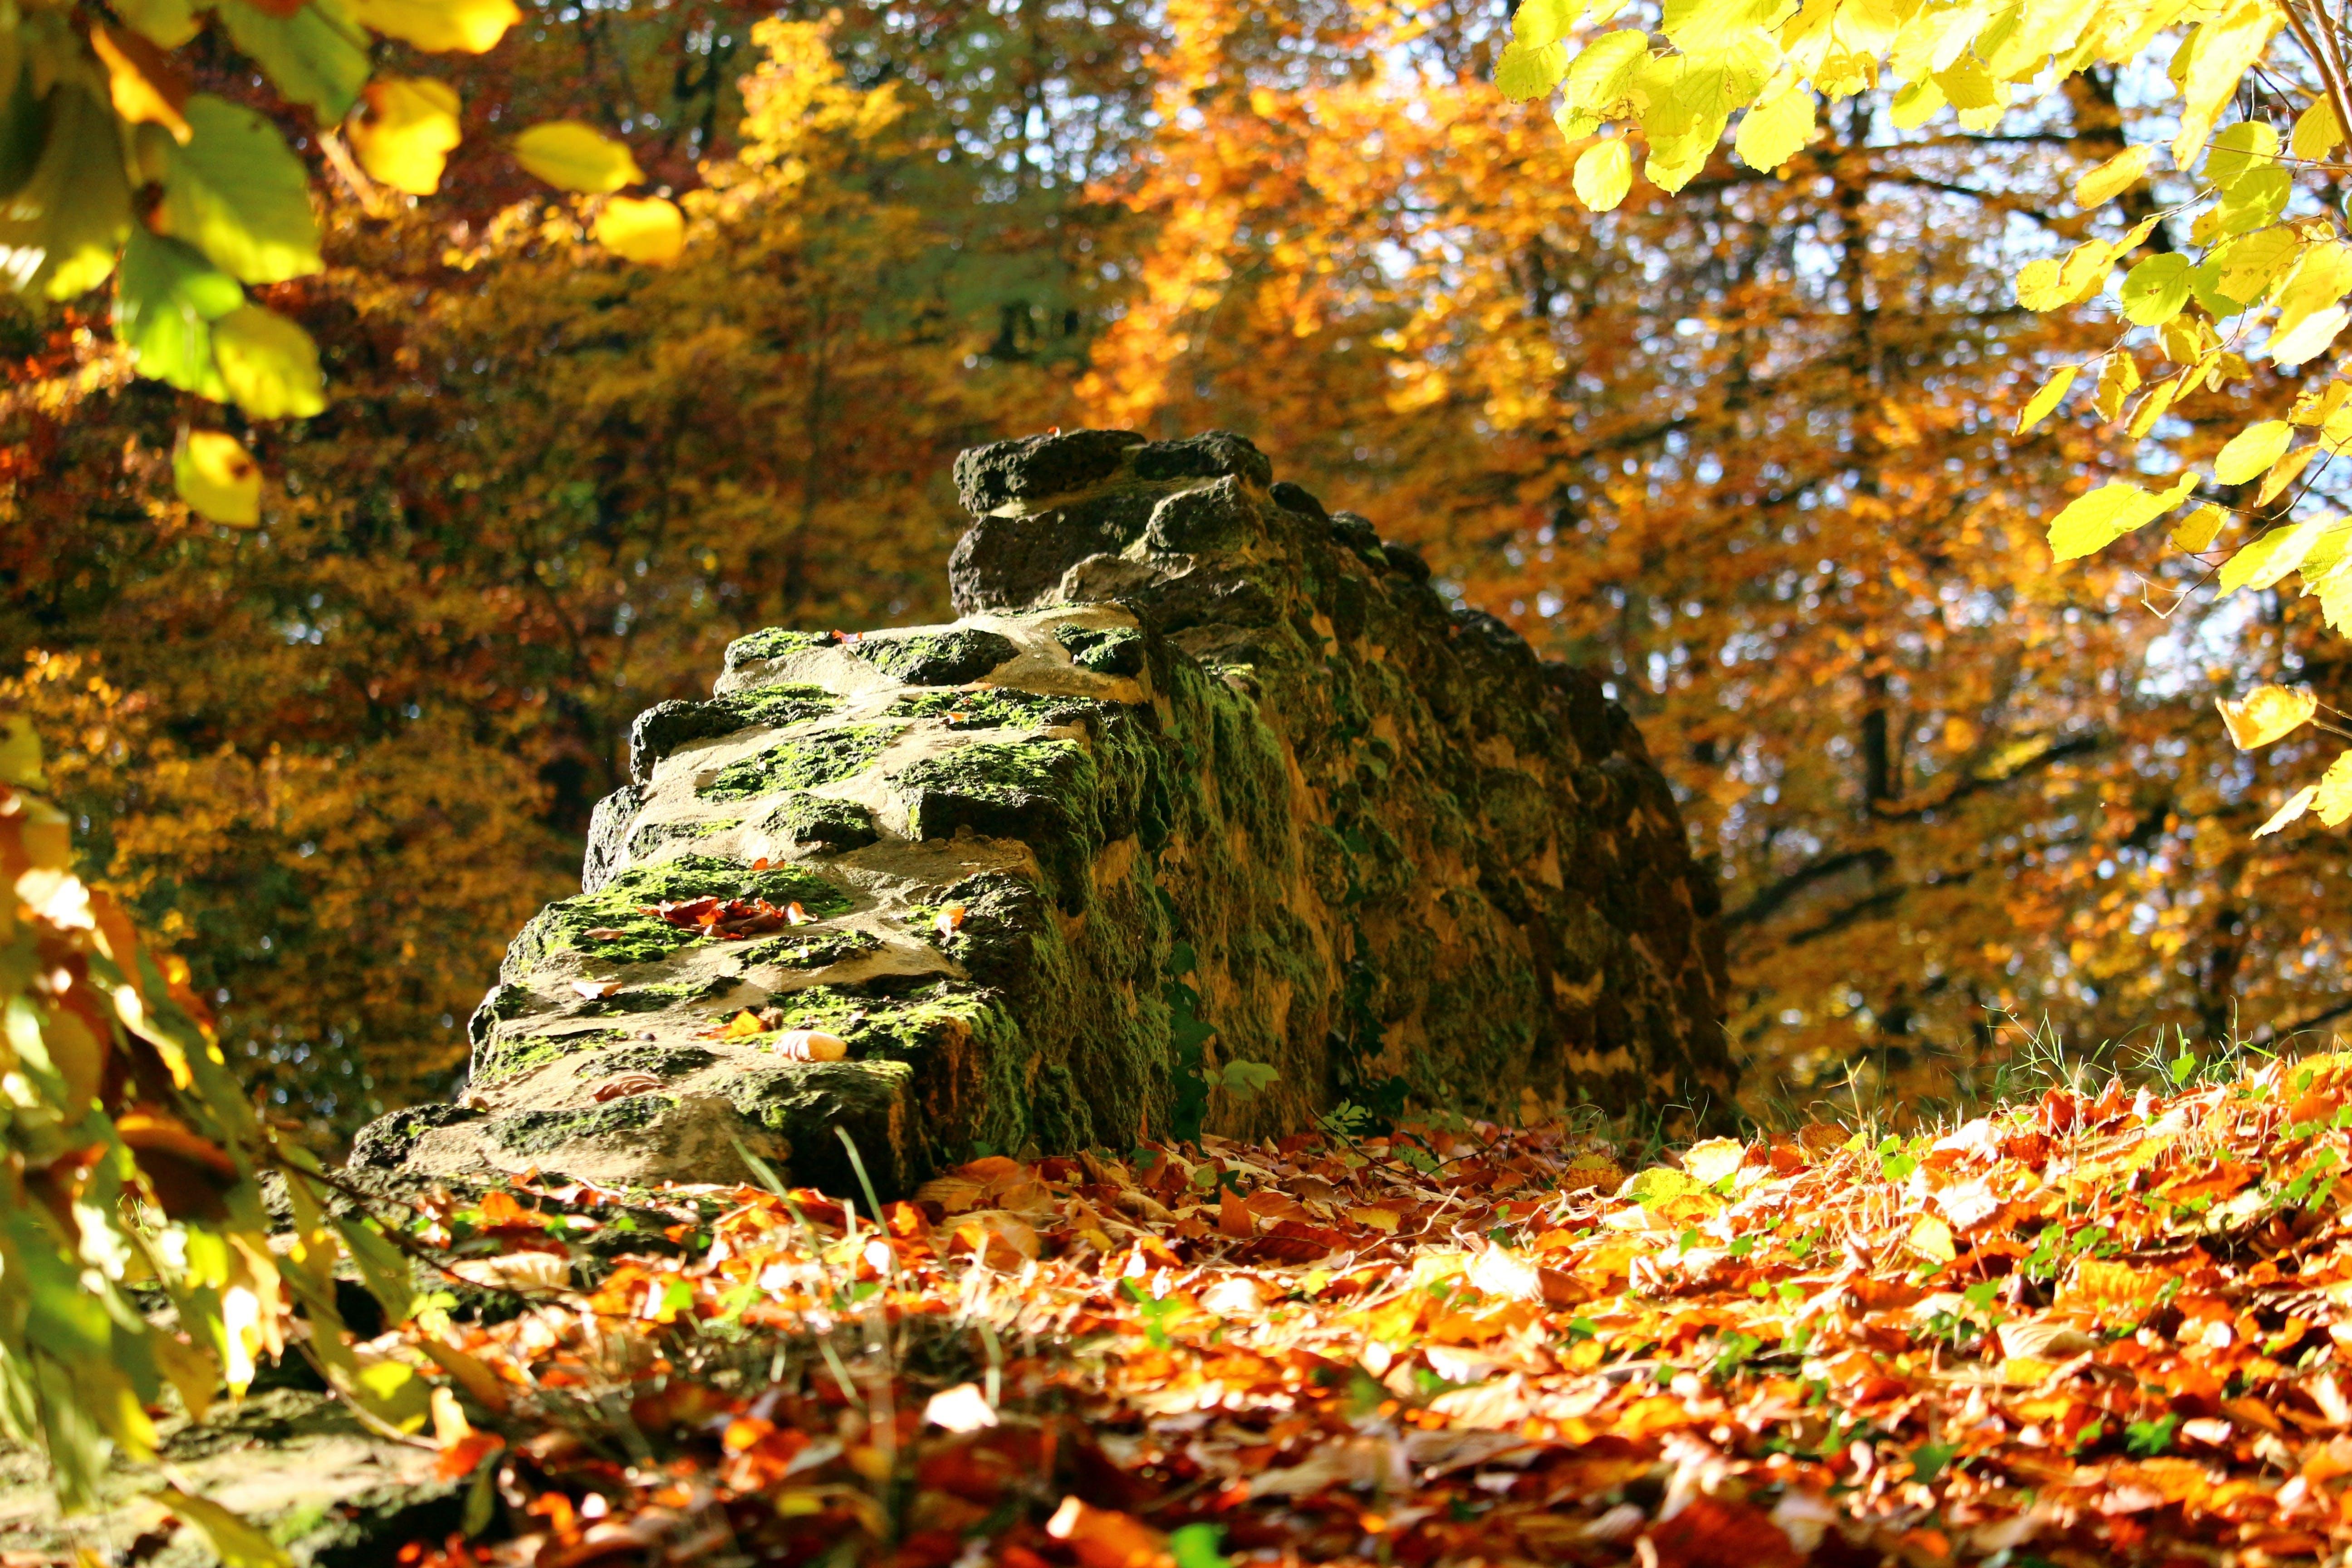 Free stock photo of autumn, stone wall, fall foliage, grotto